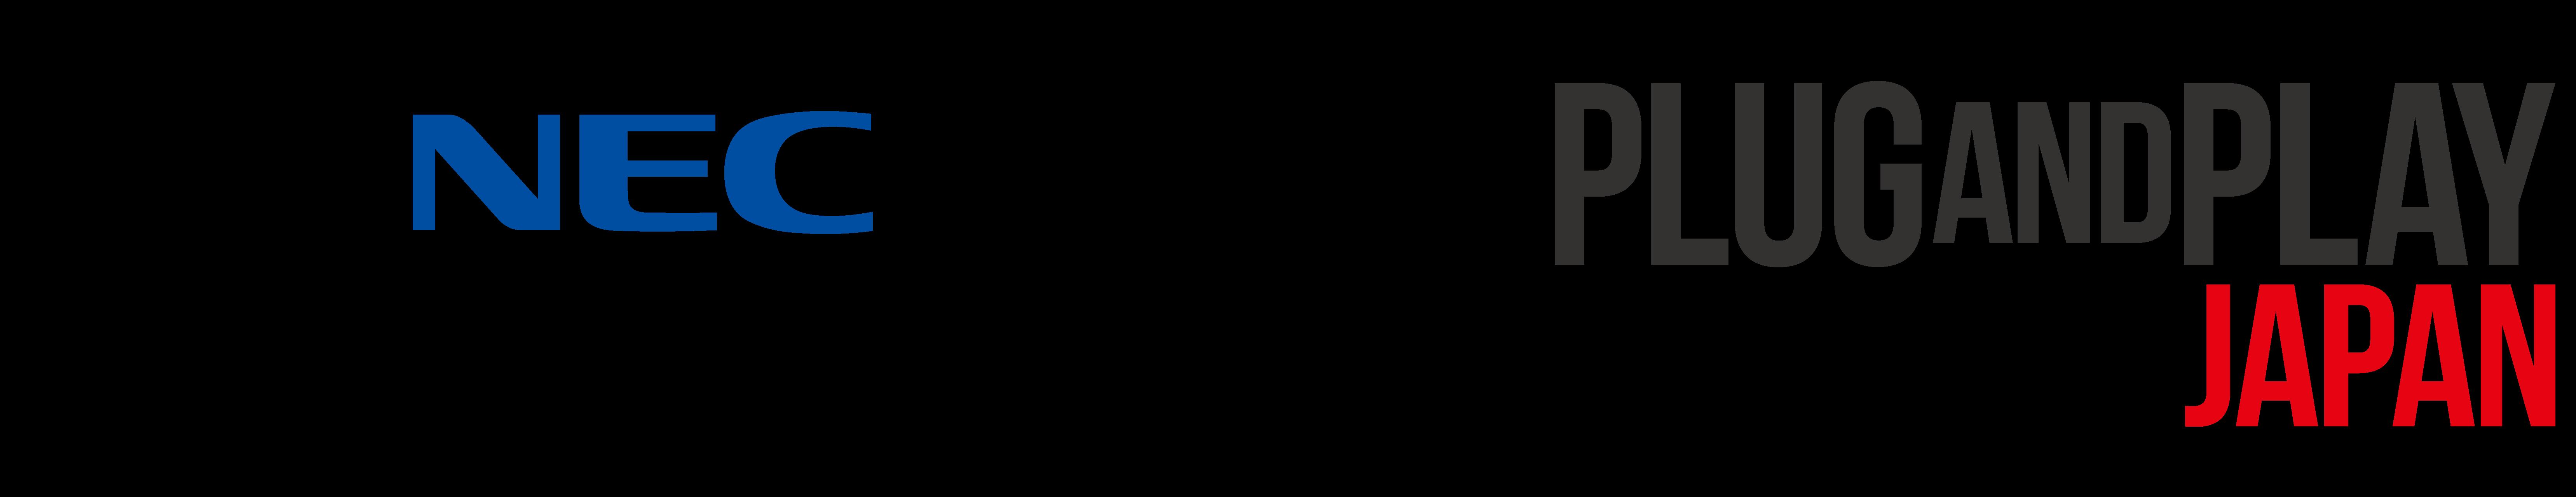 D28153-22-161859-0